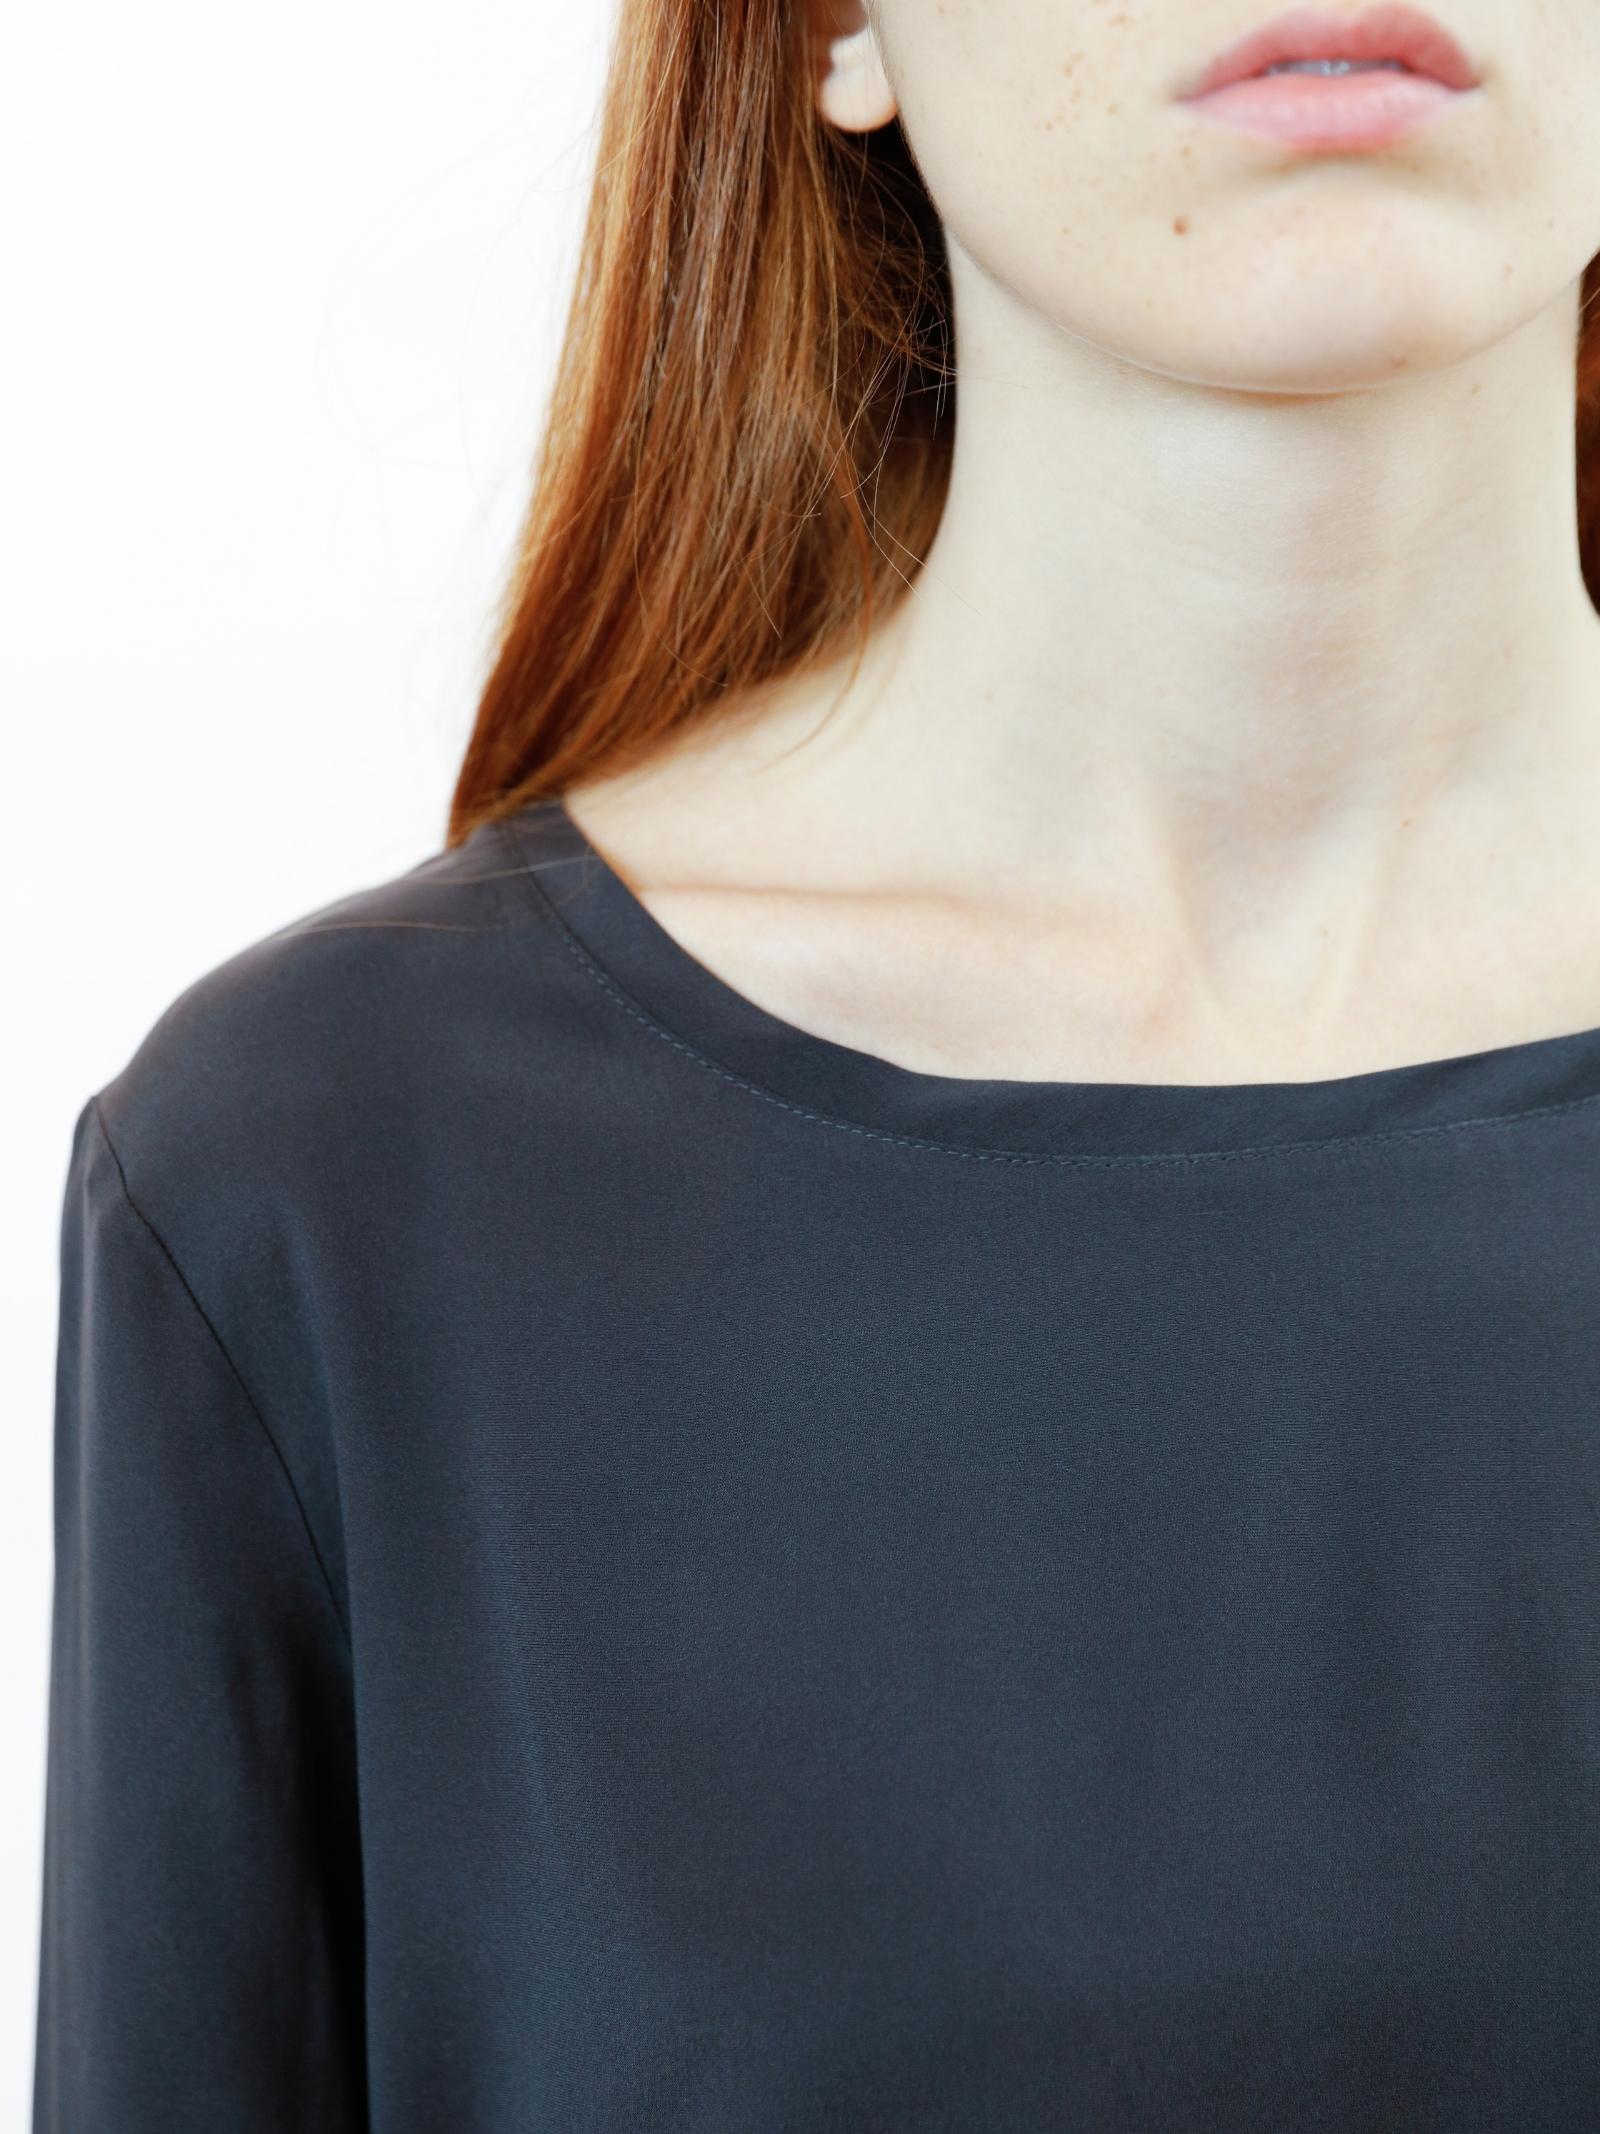 Women's Clothing Silk Satin Crew Neck Shirt in Pure Grey Silk Long Sleeves Maliparmi | Shirts and tops | JM40603102021009